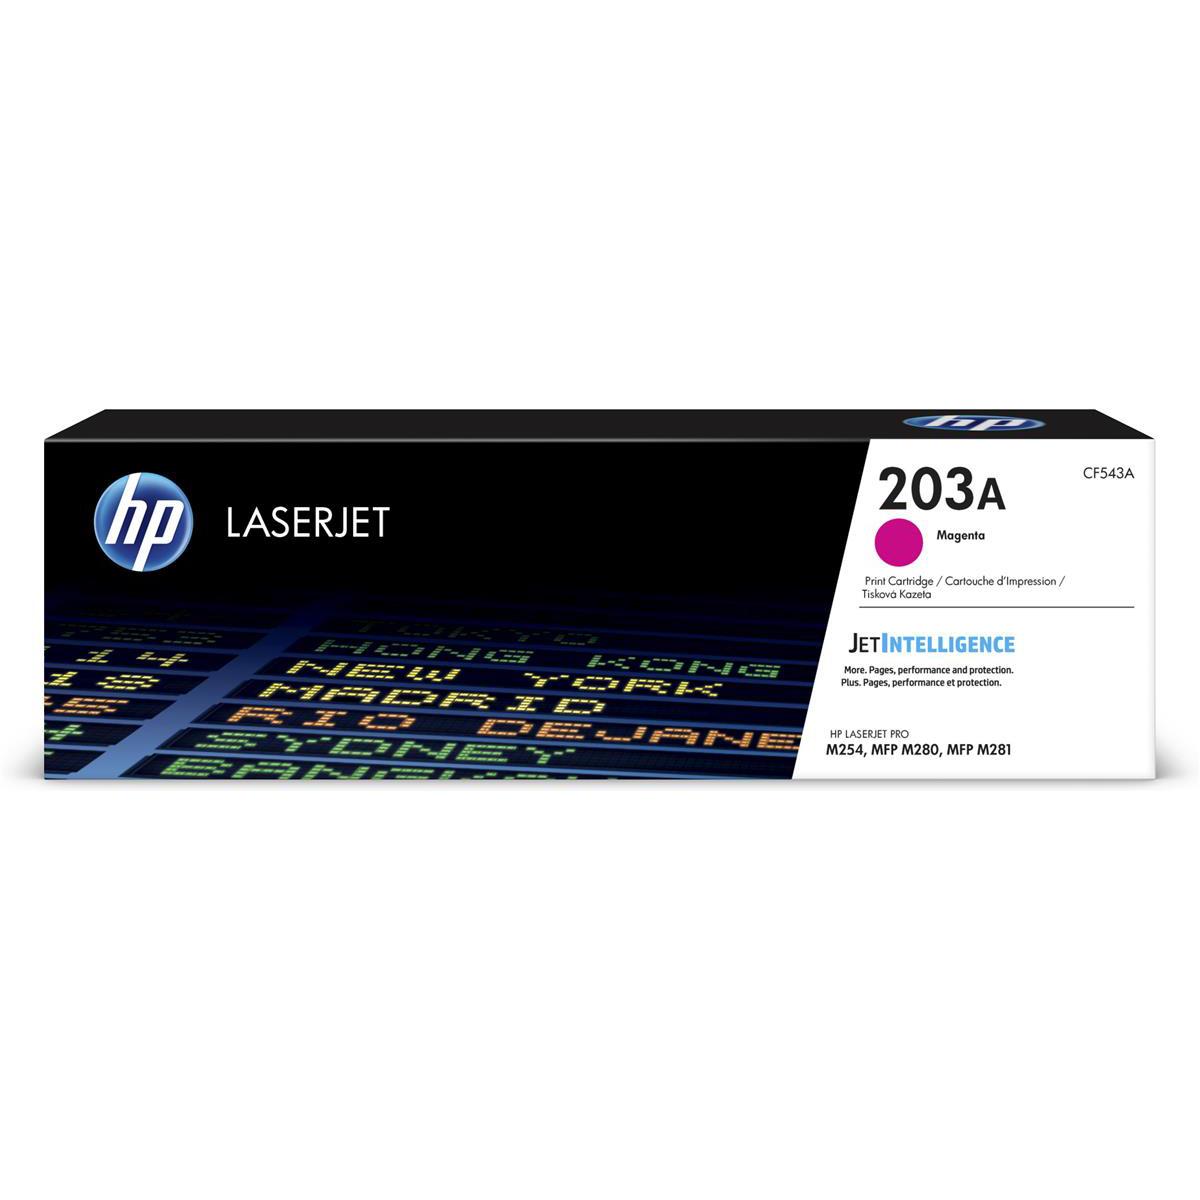 HP 203A LaserJet Toner Cartridge Page Life 1300pp Magenta Ref CF543A